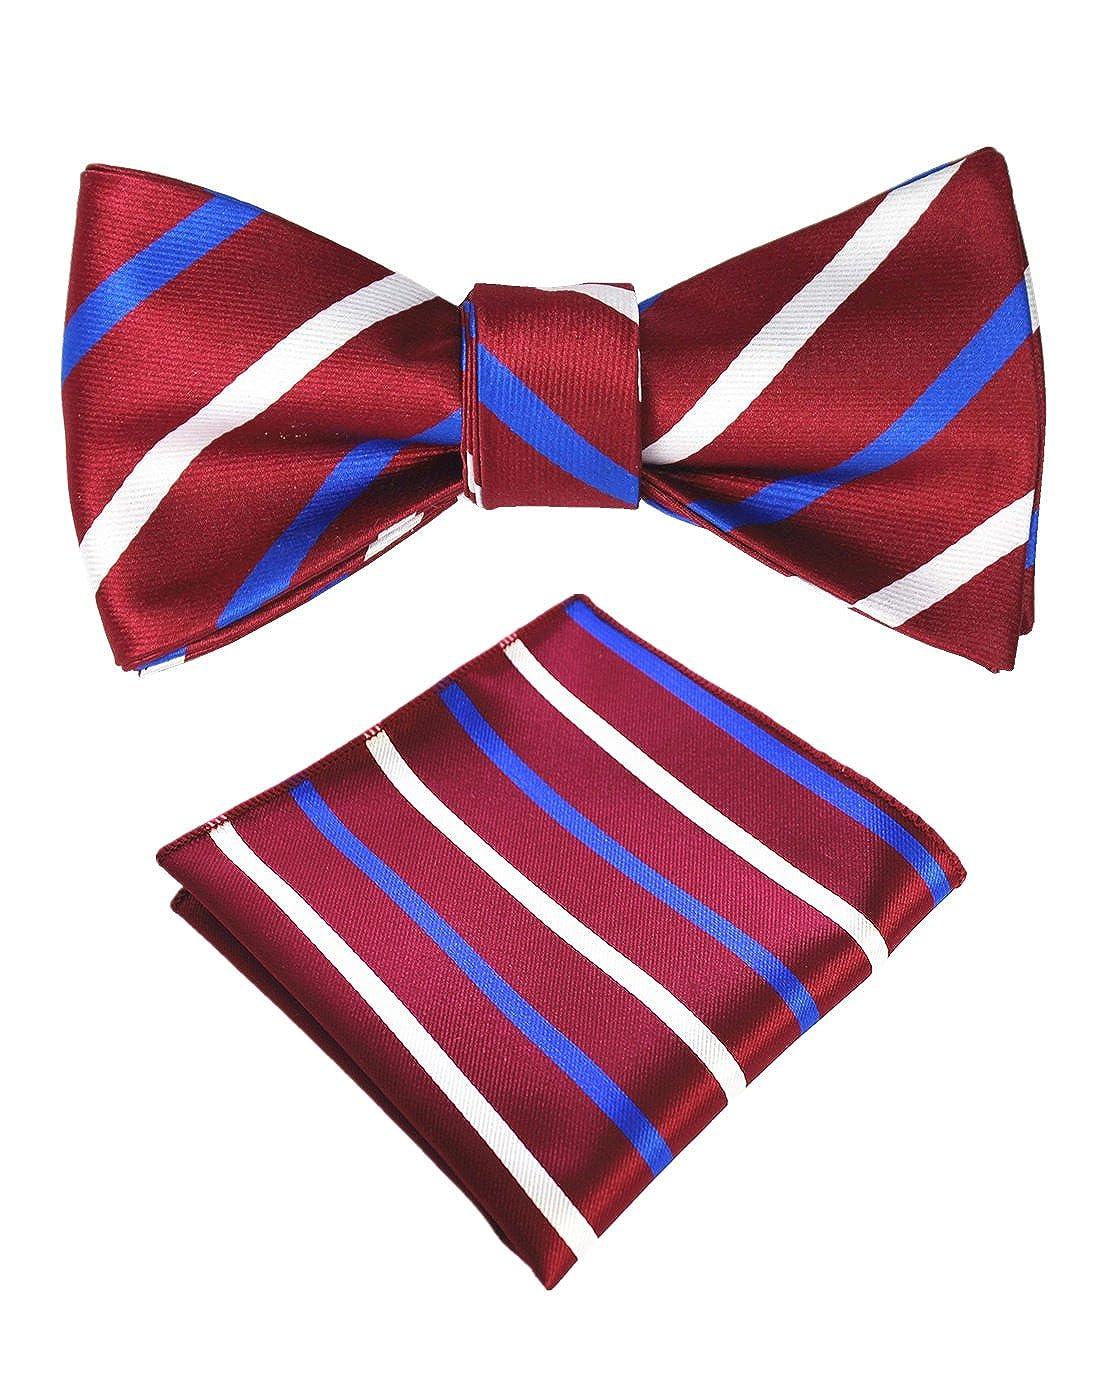 15bde9ae9d01 JEMYGINS Original Burgundy Stripe Mens Bowtie Self Bow Tie & Pocket Square  Set (01#3): Amazon.ca: Luggage & Bags